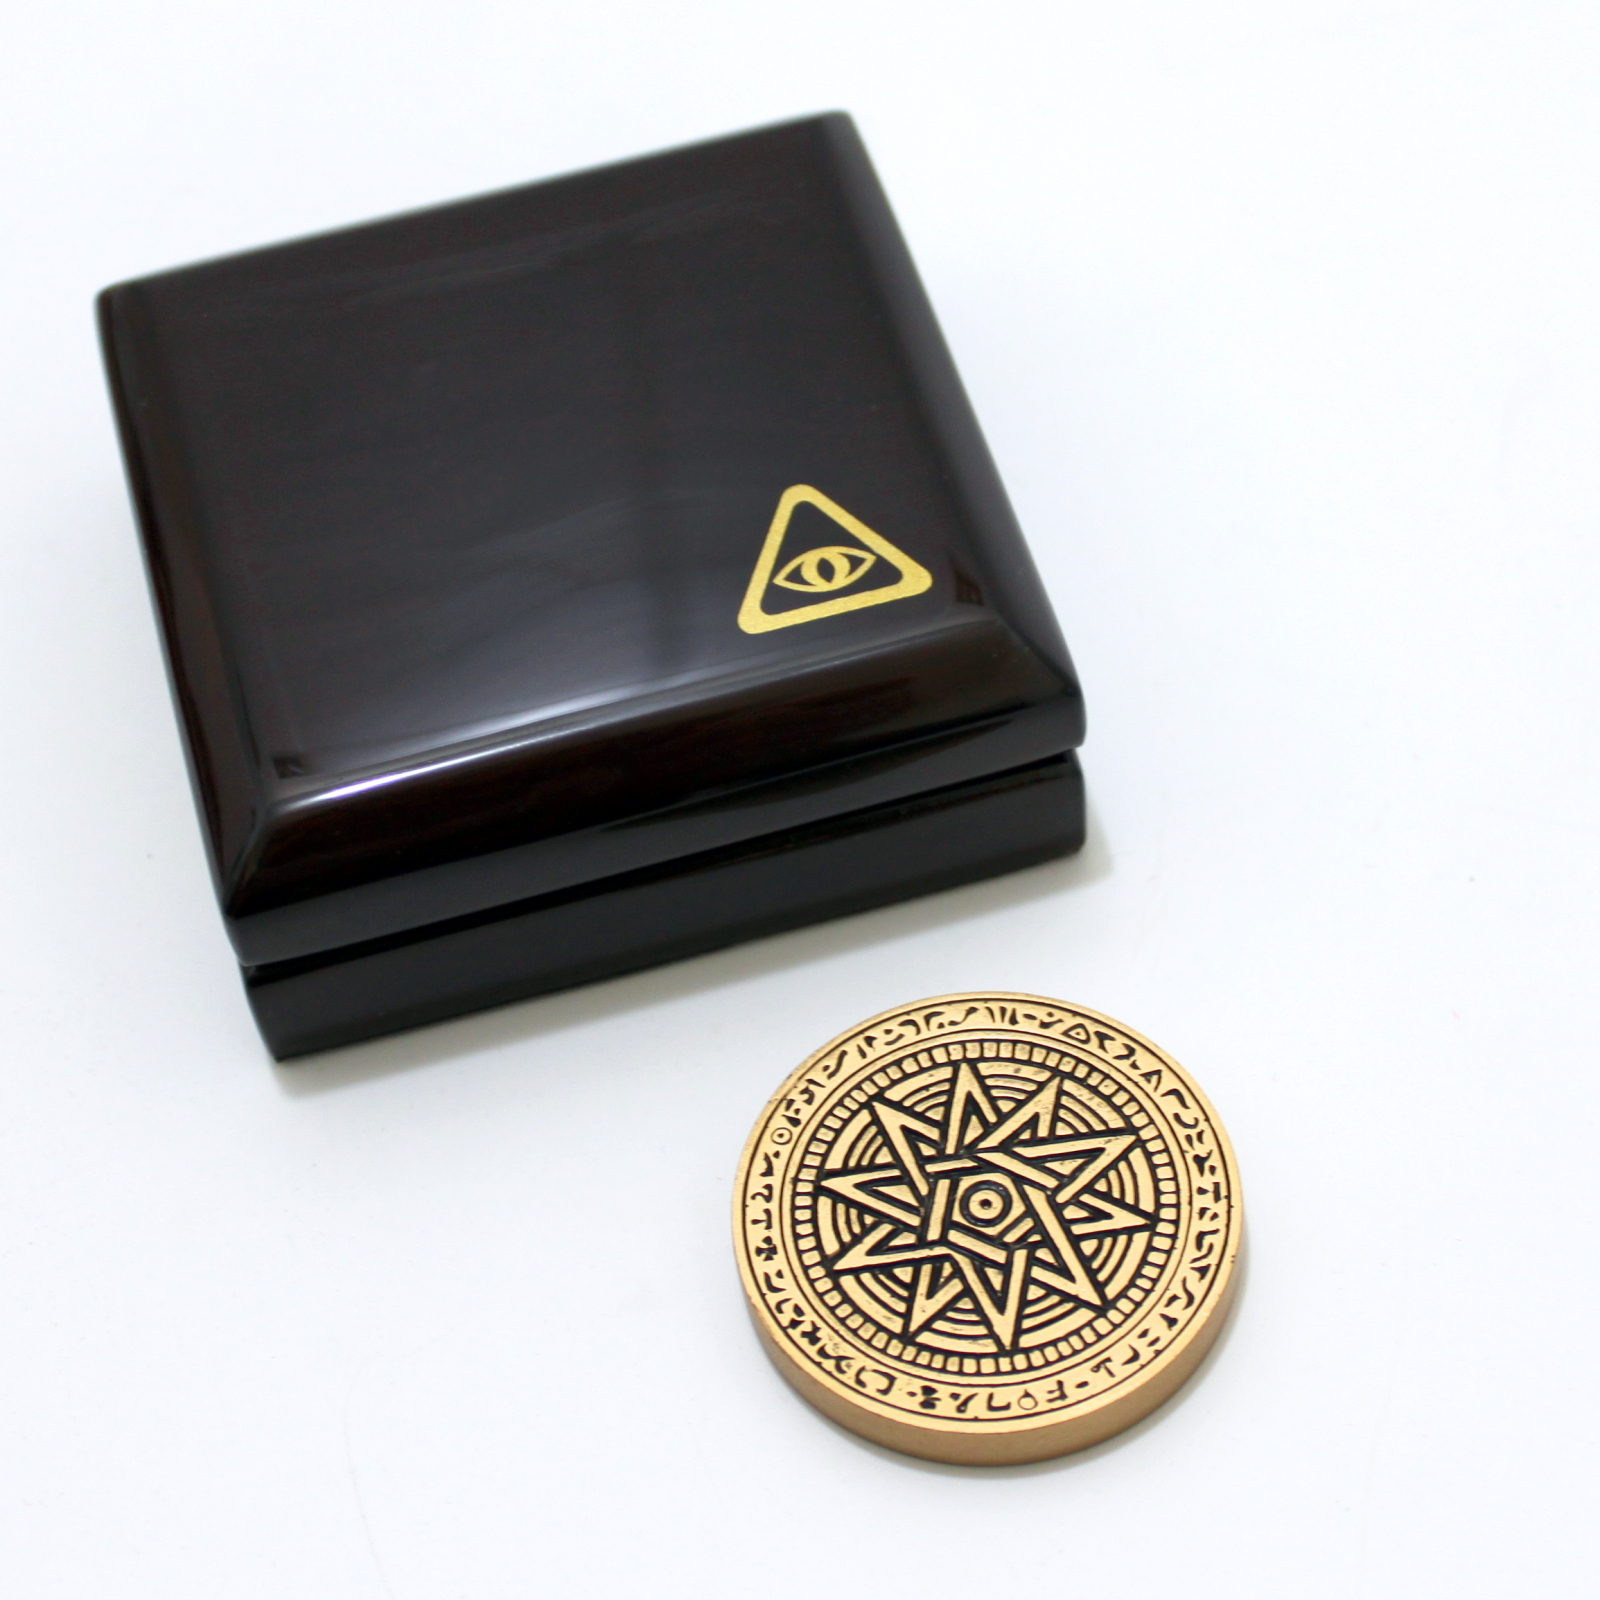 Bermuda Medallion by Magic Wagon, Tony Curtis